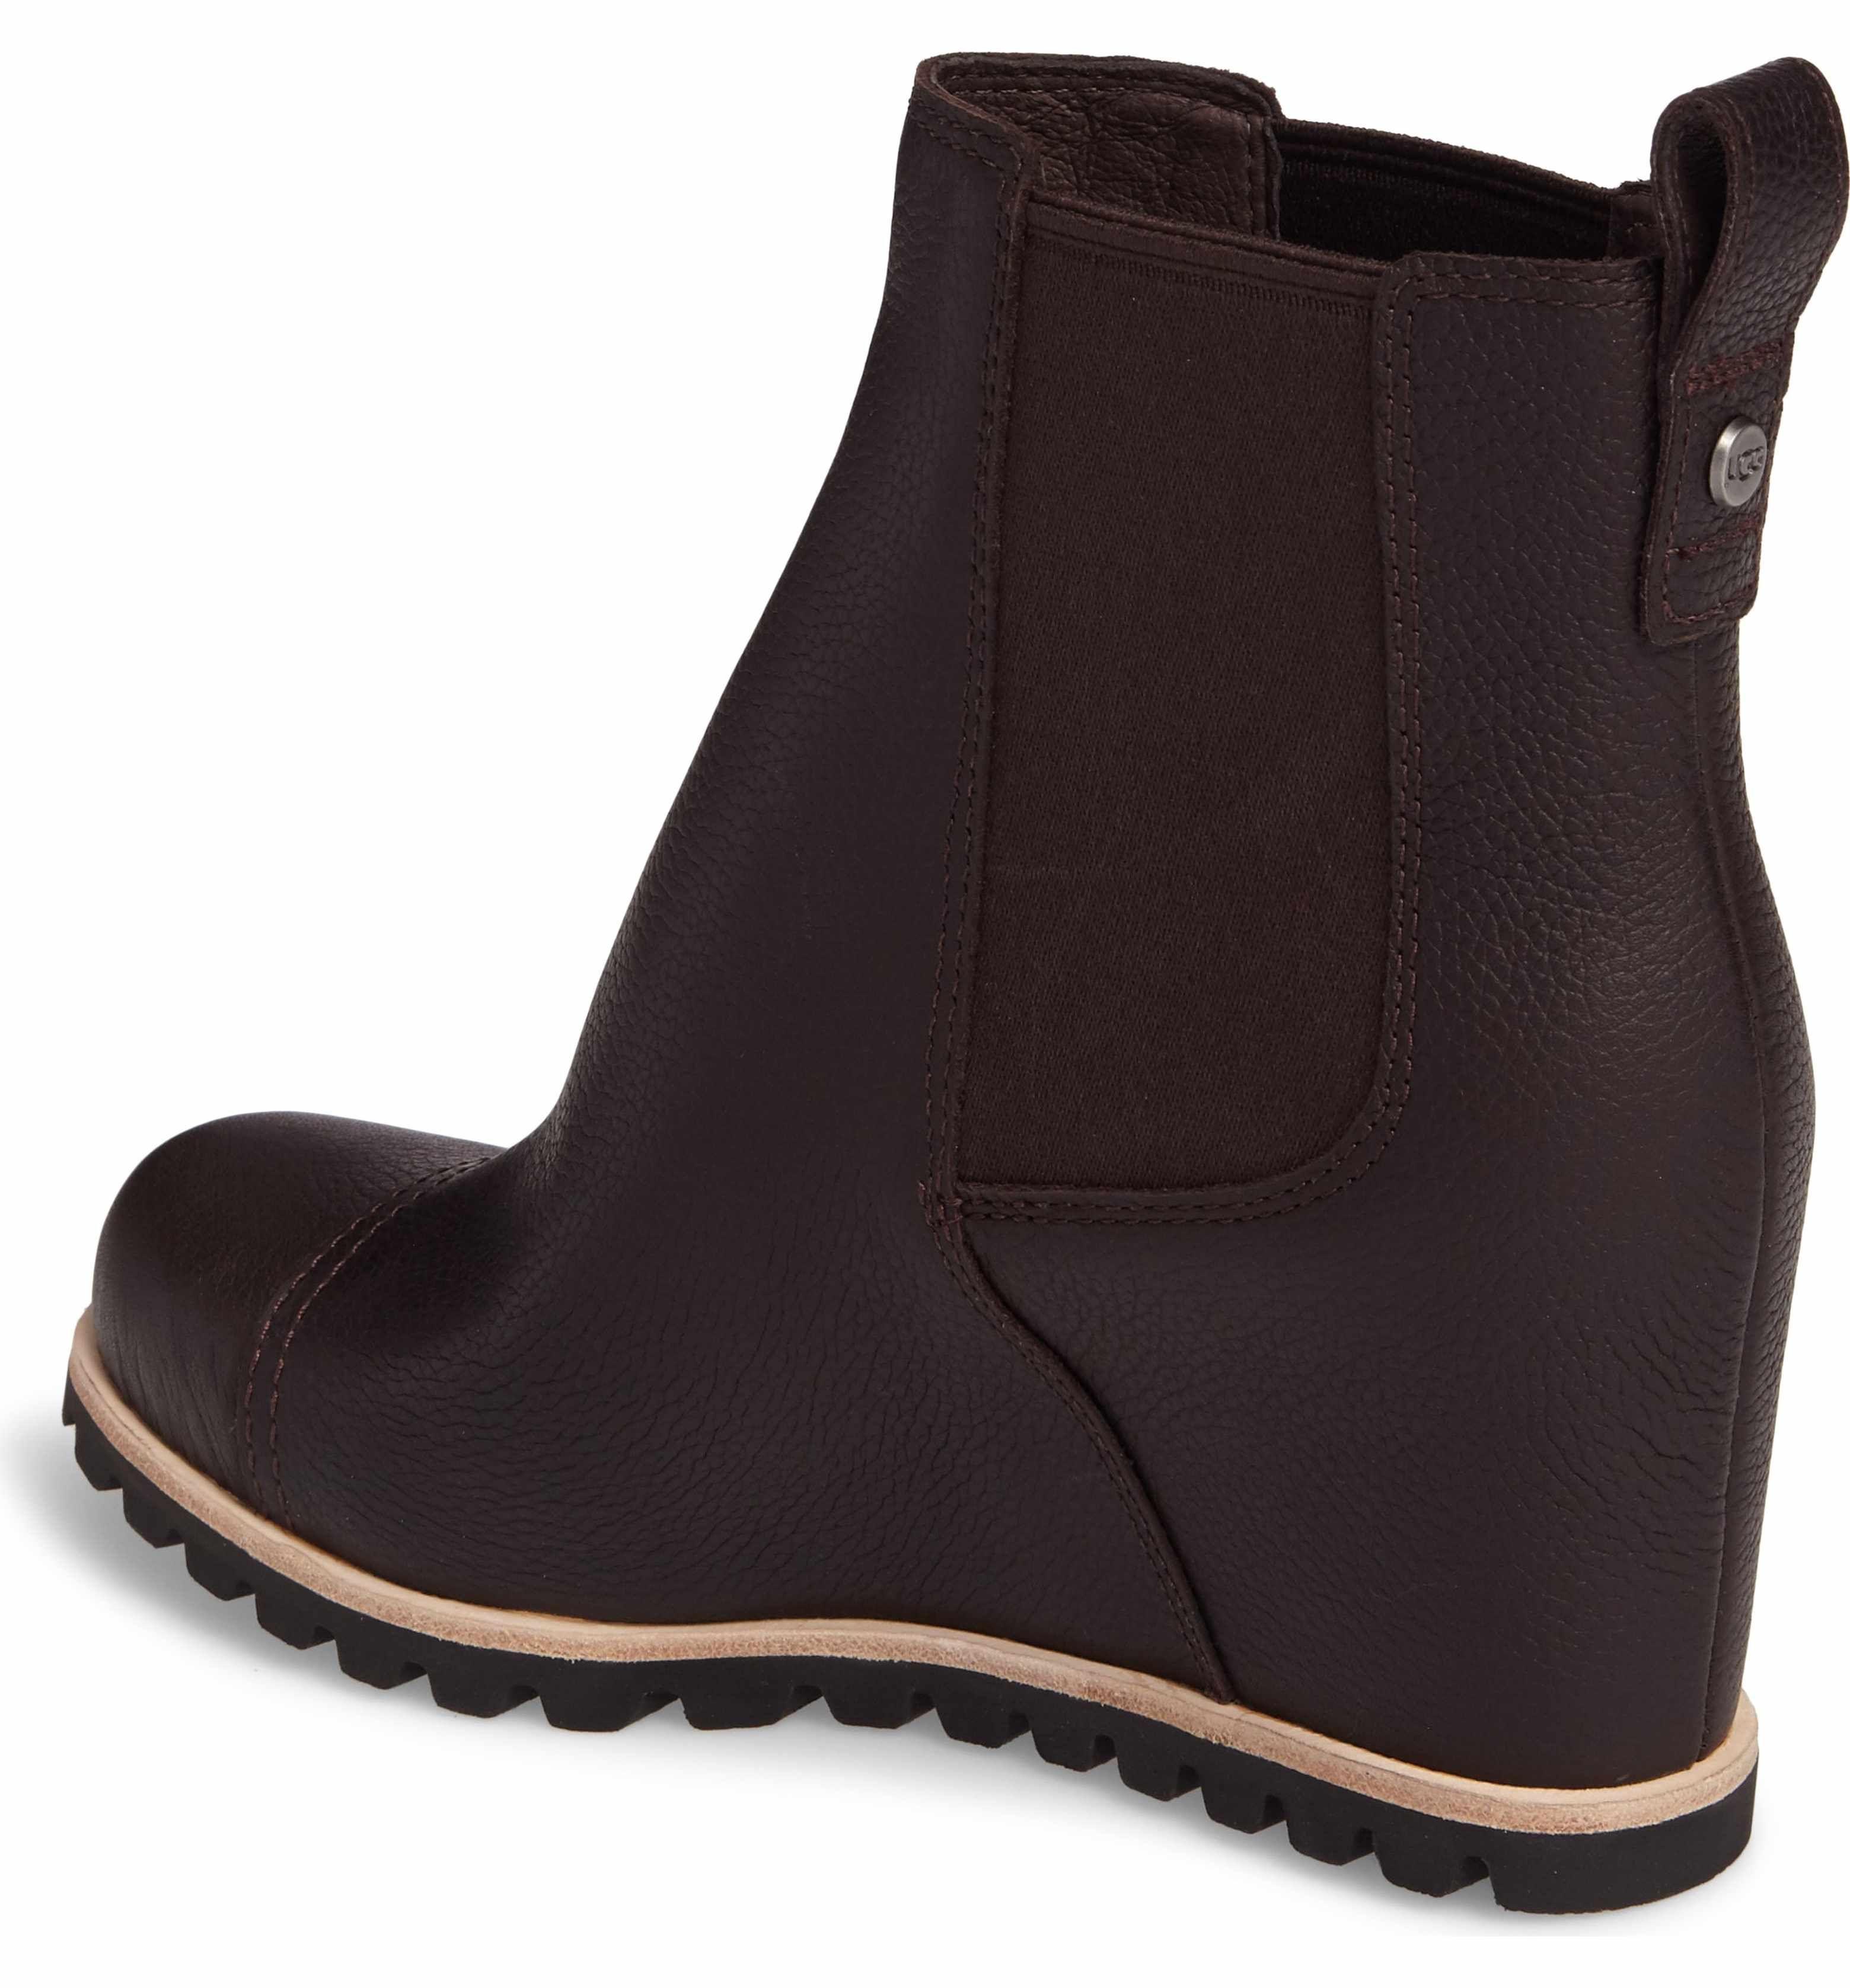 Main Image - UGG® Pax Waterproof Wedge Boot (Women)